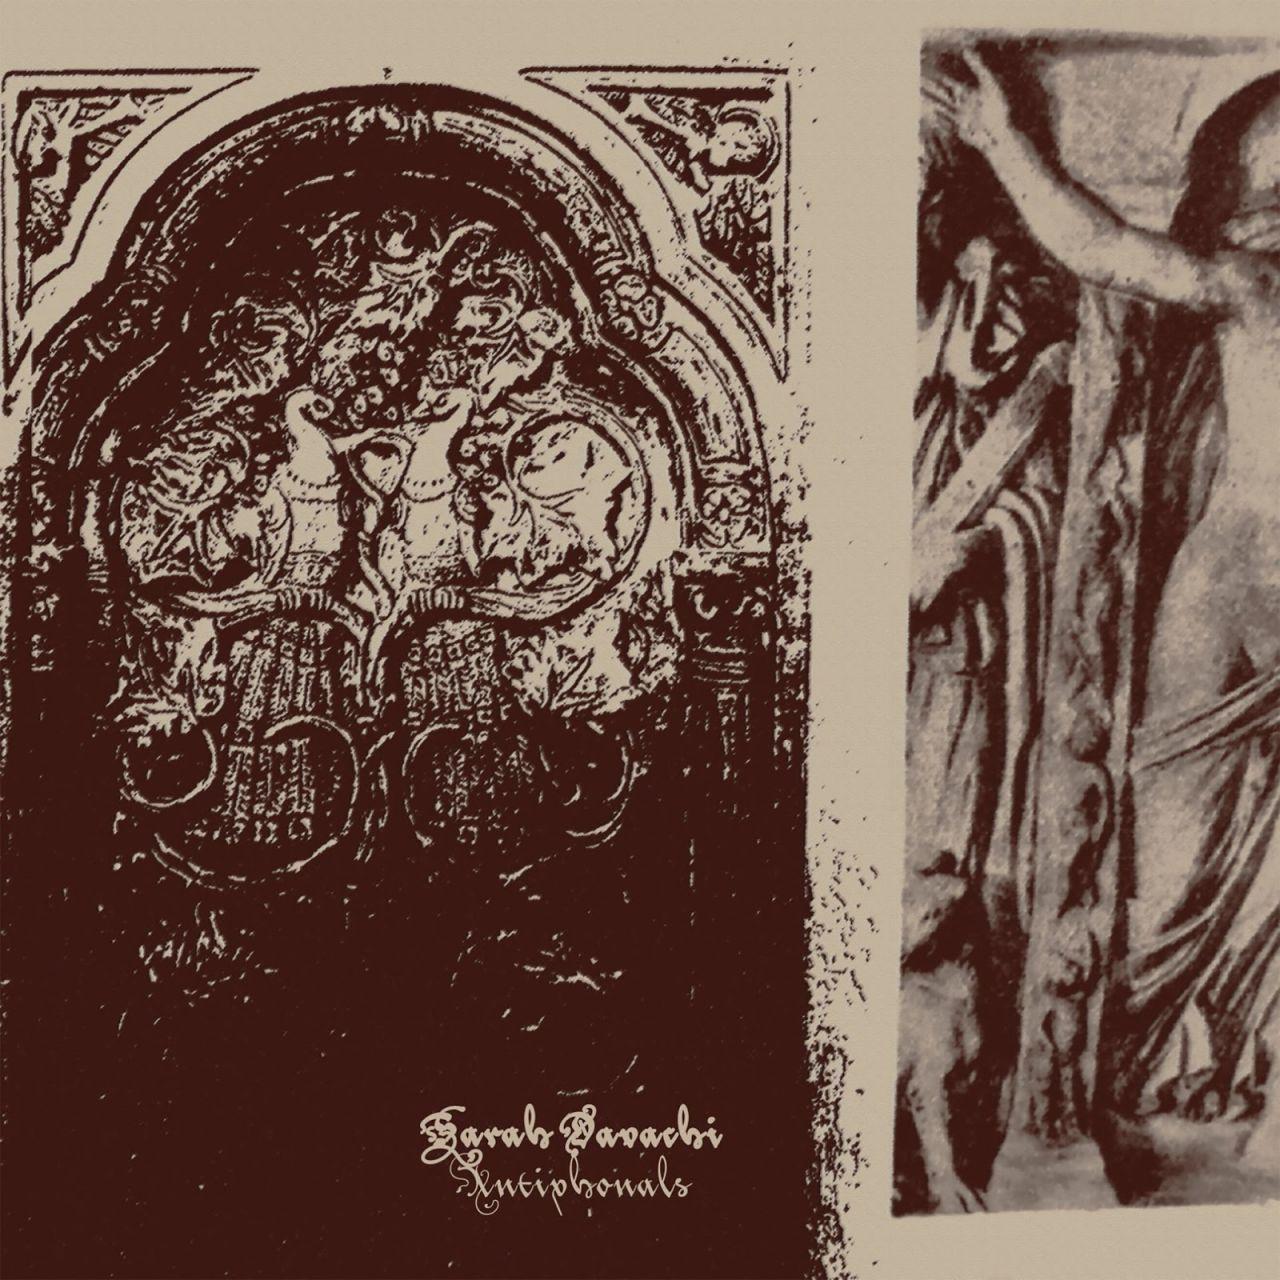 Sarah Davachi - Antiphonals - LP